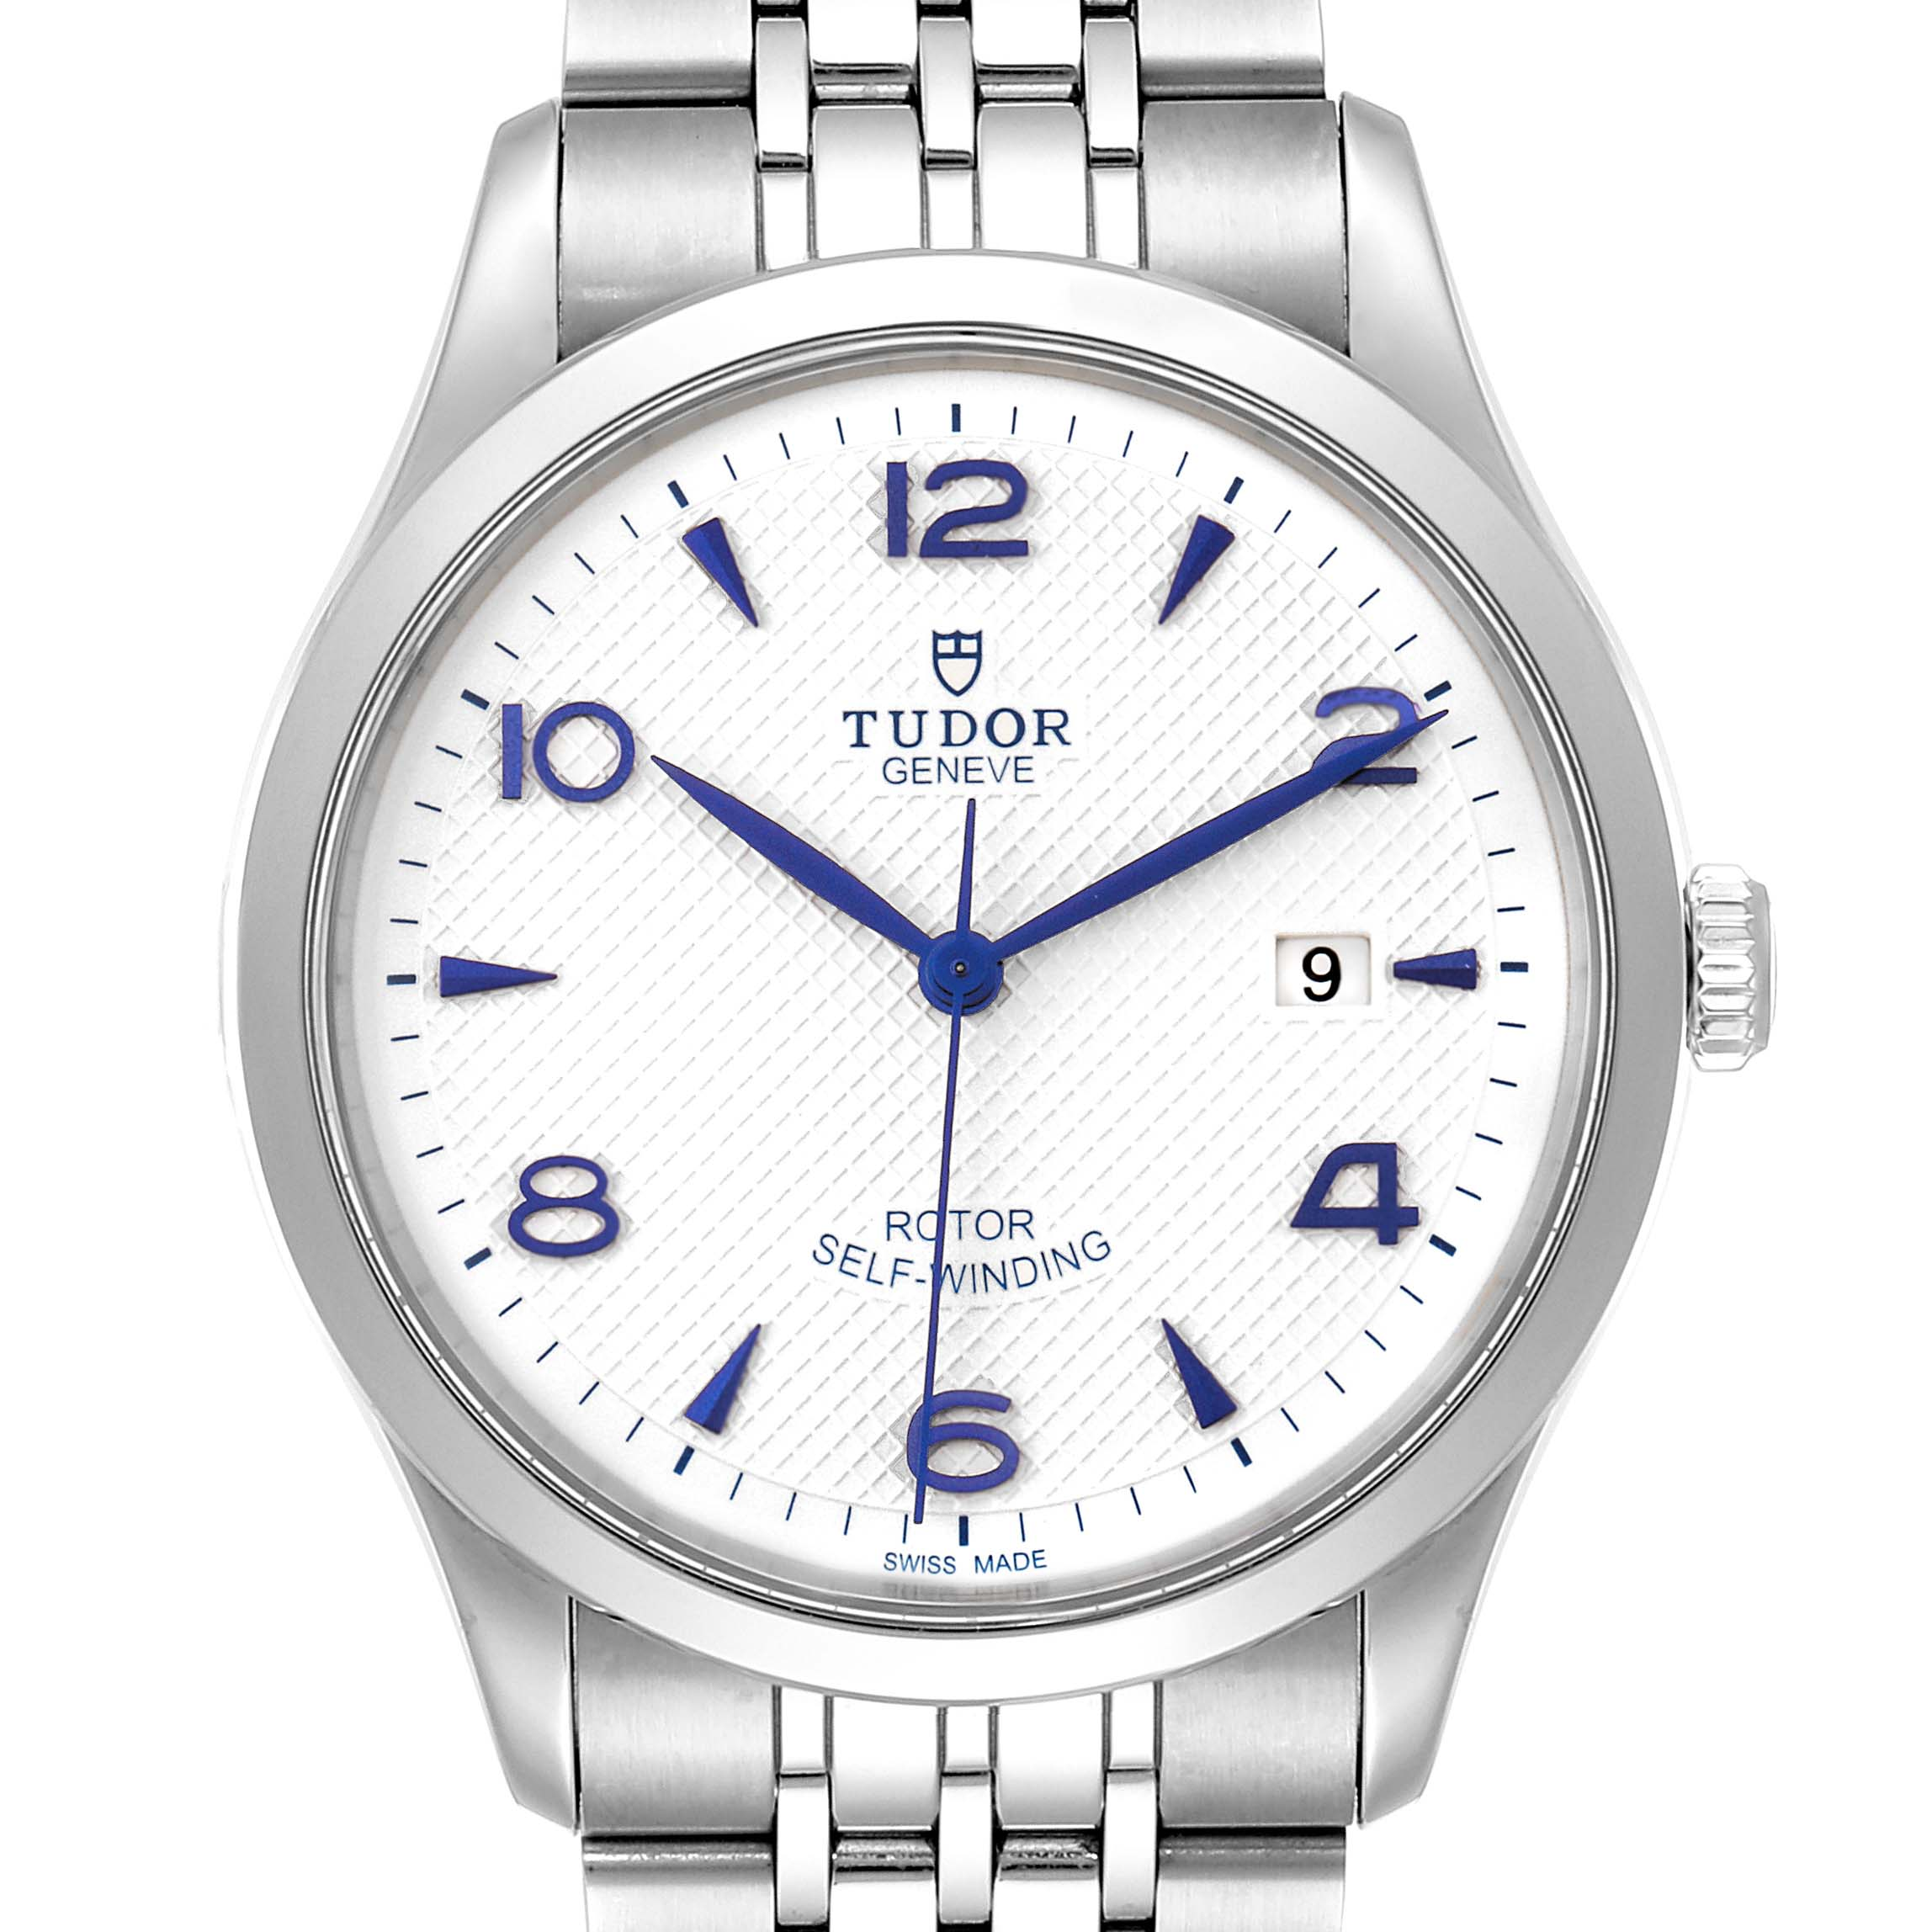 Tudor 1926 Opaline Dial Automatic 41mm Steel Mens Watch 91650 Box Card SwissWatchExpo